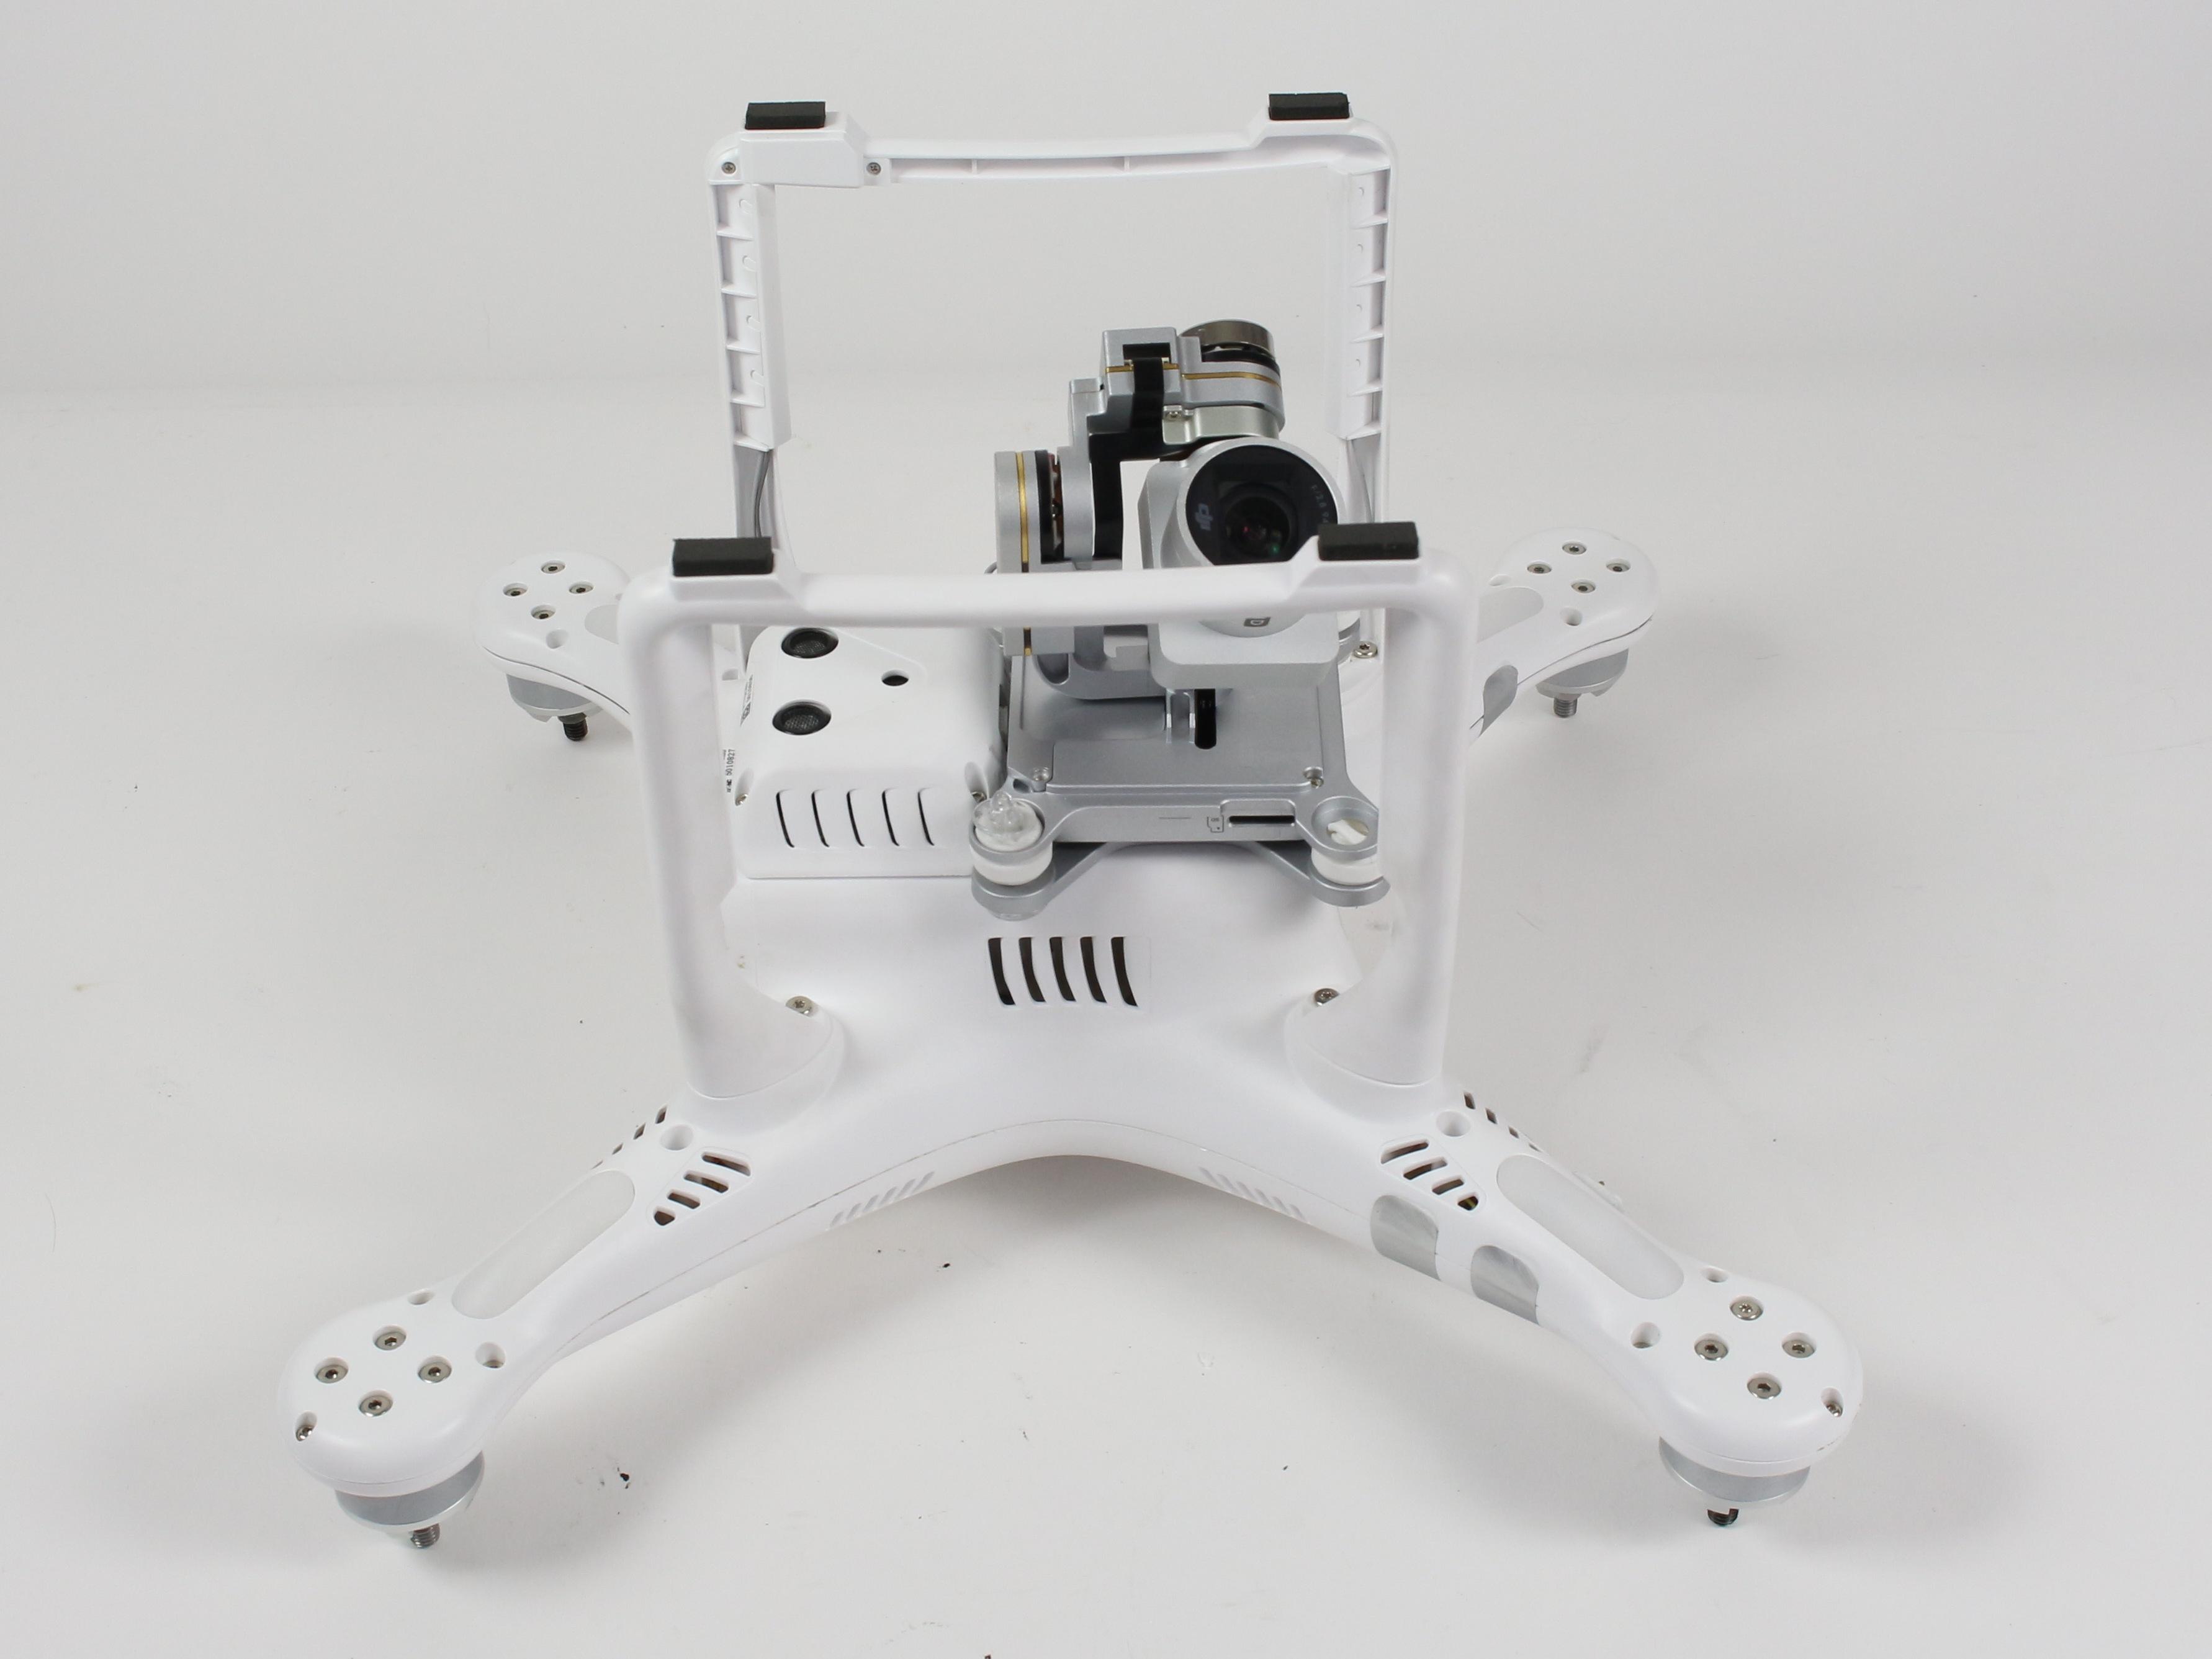 Dji Phantom 3 Advanced Repair Ifixit Quadcopter Gimbal Wiring Diagram Landing Gear